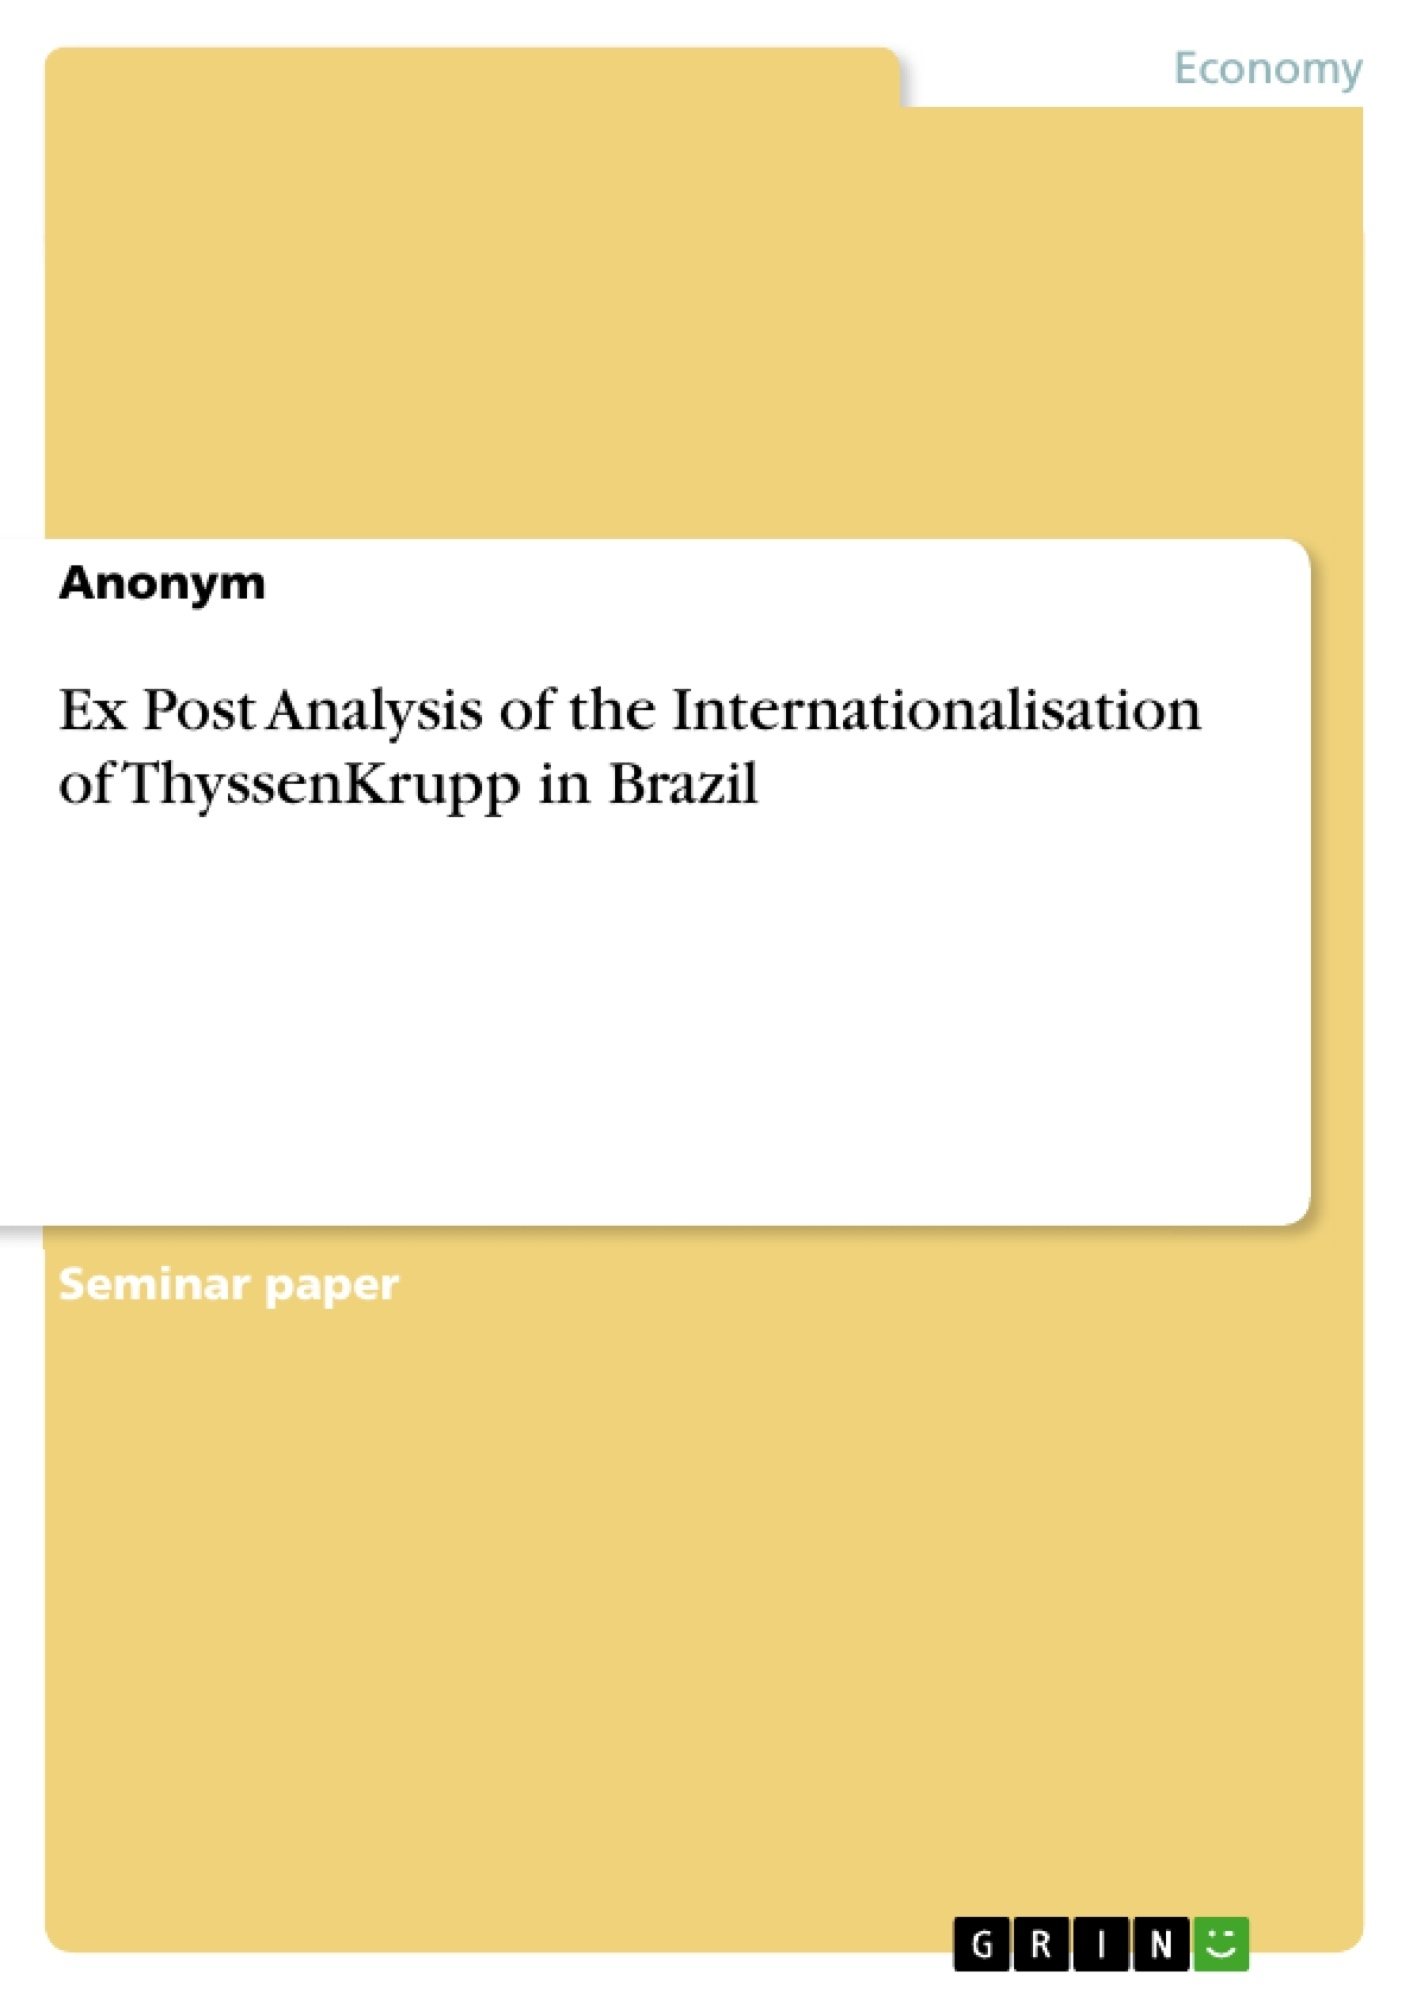 Title: Ex Post Analysis of the Internationalisation of ThyssenKrupp in Brazil